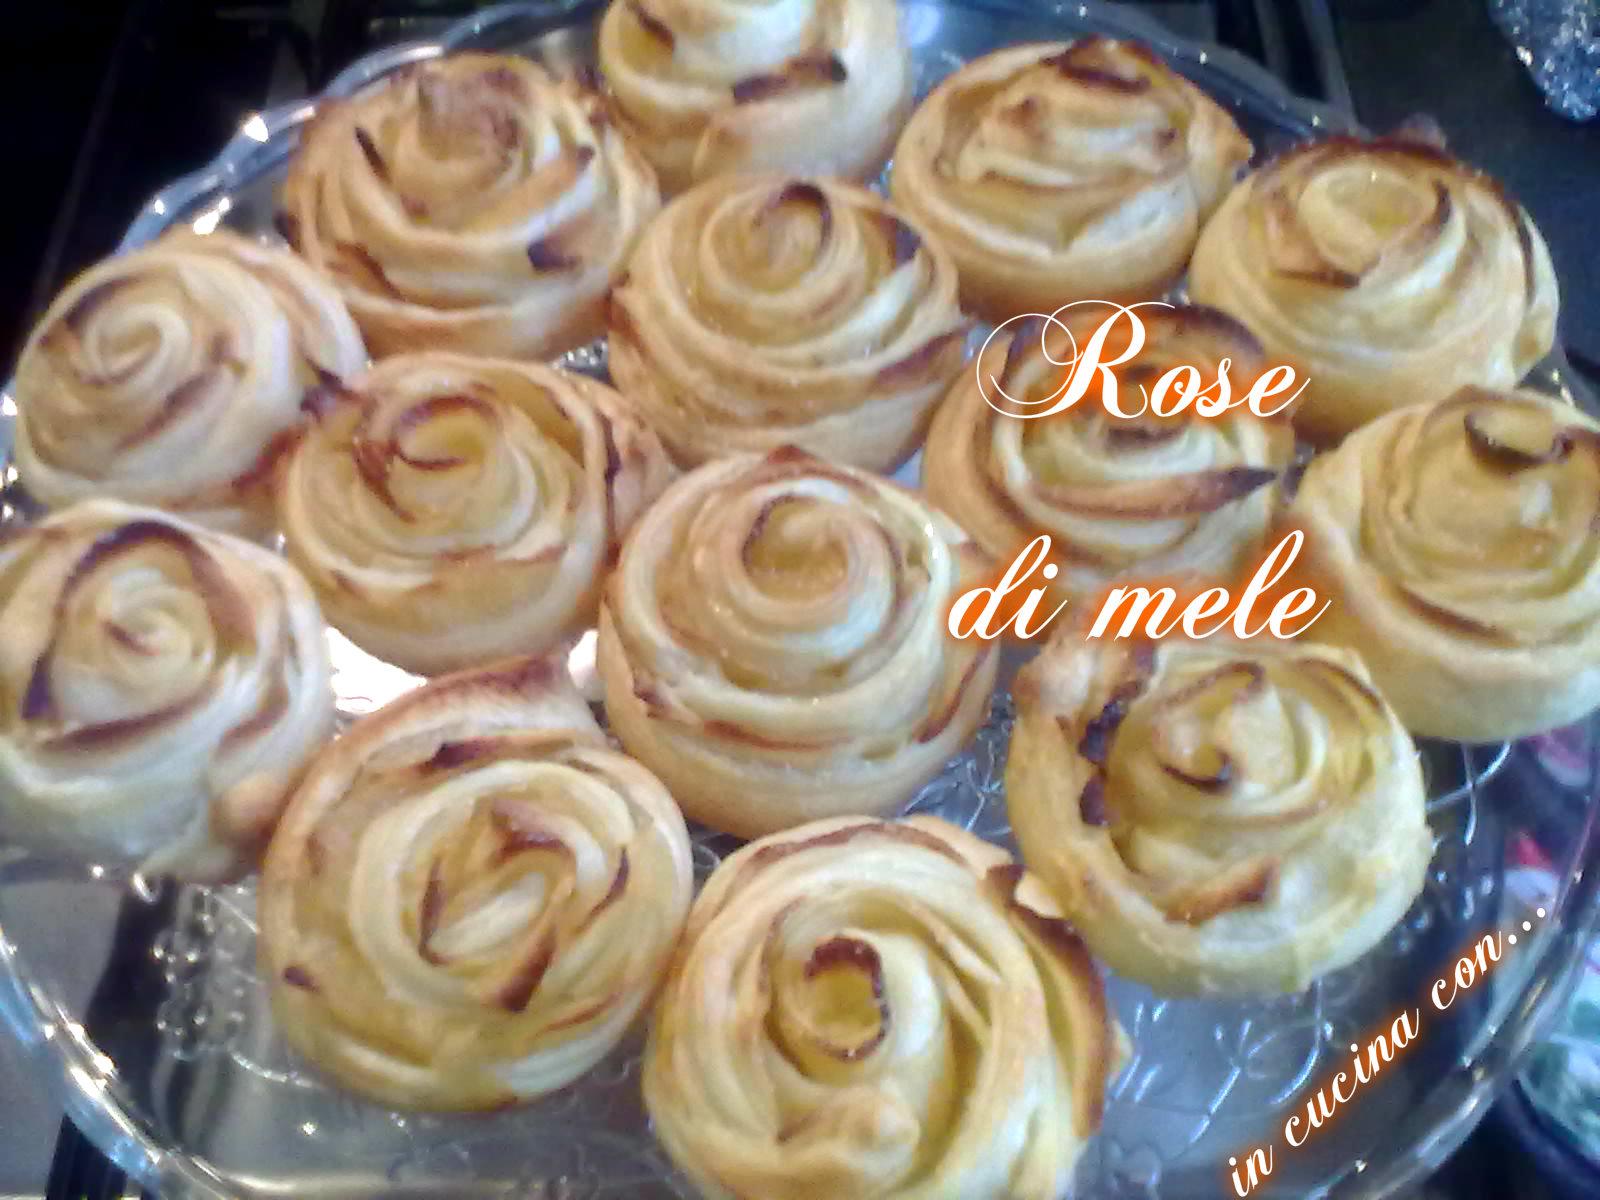 ROSE DI MELE, ricetta facile | In Cucina con ...